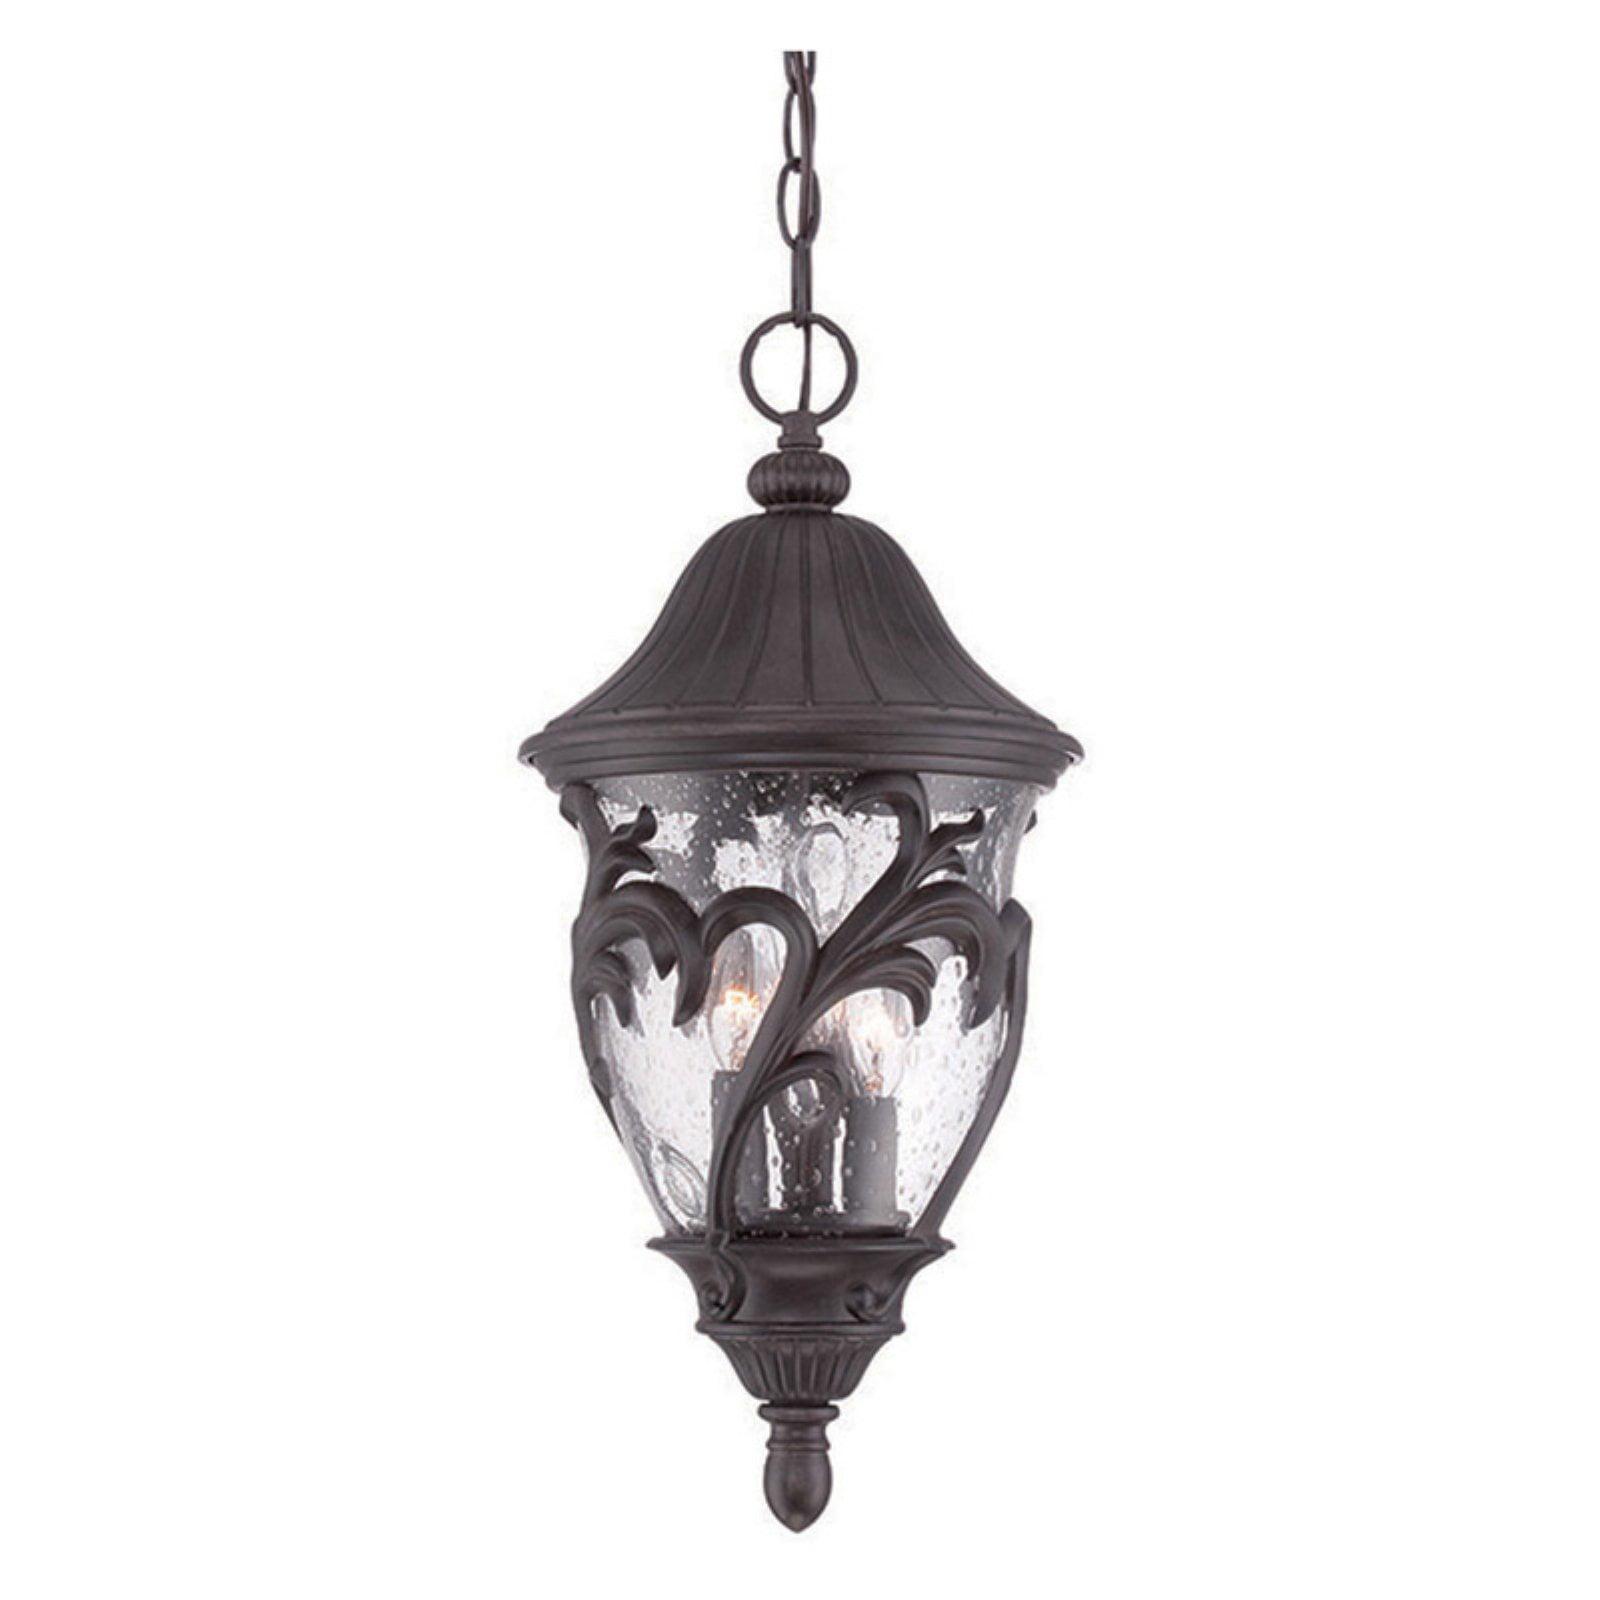 Porch Light Walmart: Acclaim Lighting Capri Outdoor Hanging Lantern Light